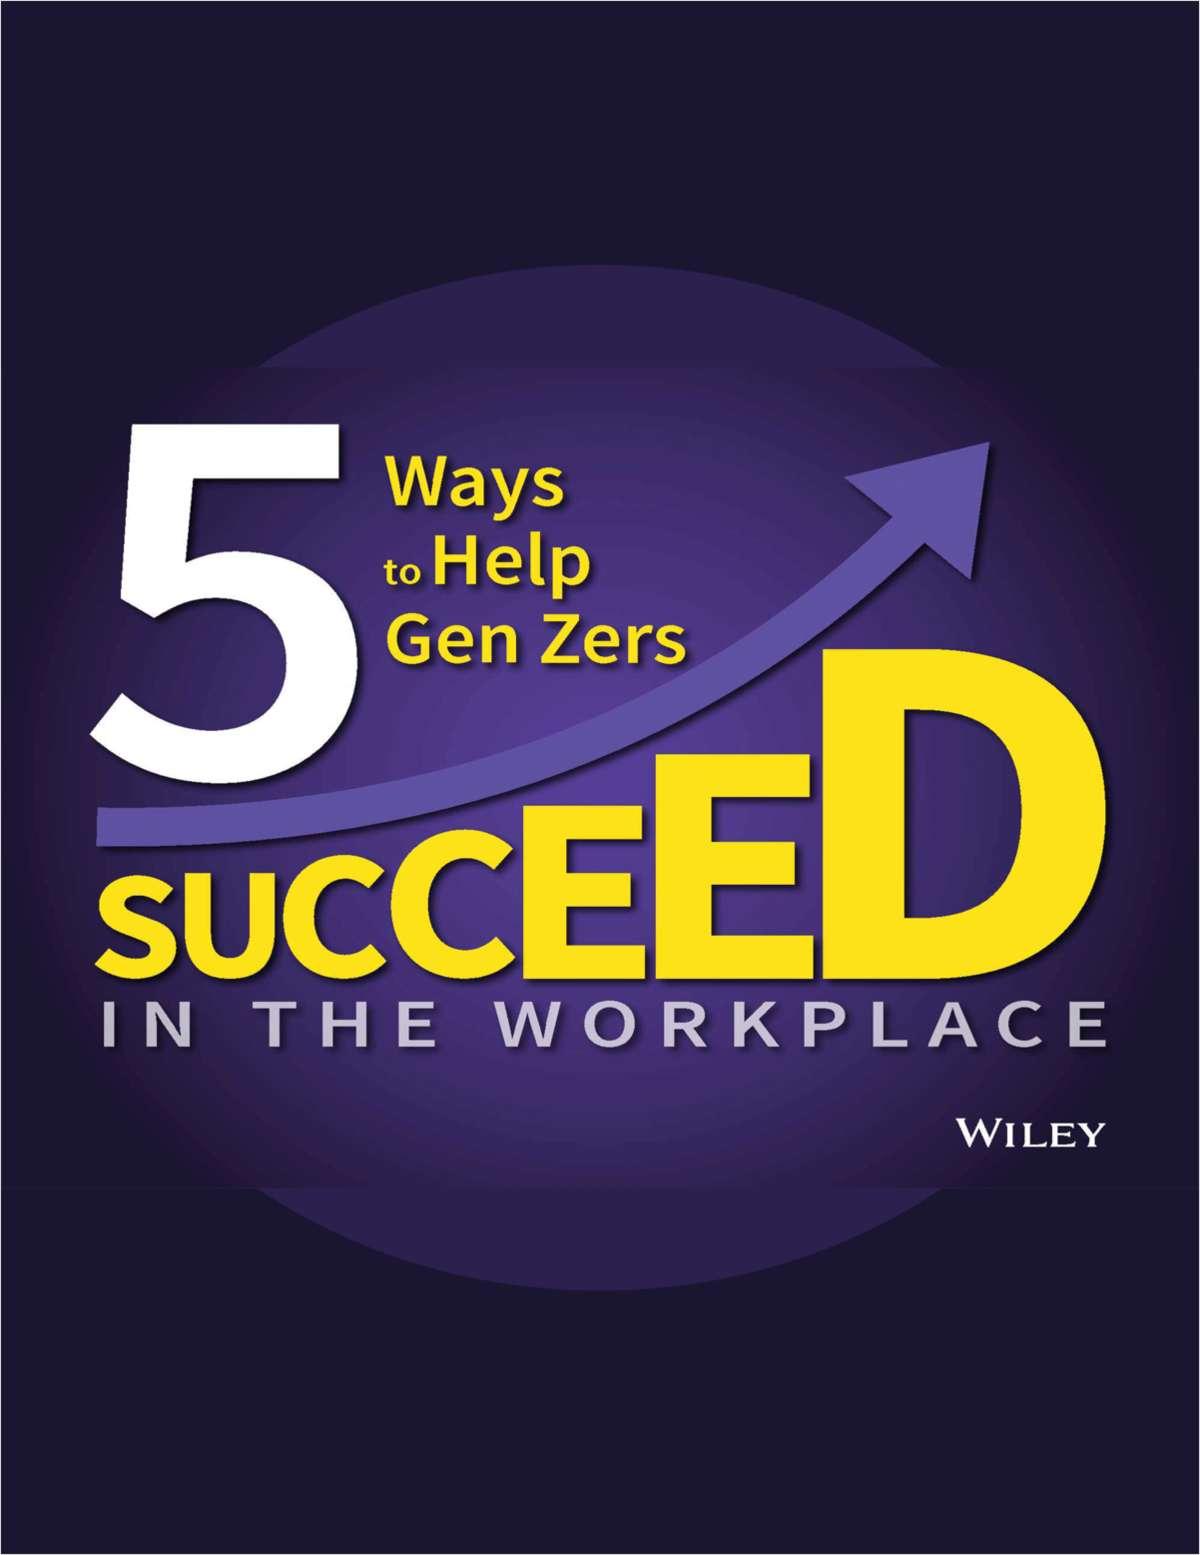 5 Ways to Help Gen Zers Succeed in the Workplace